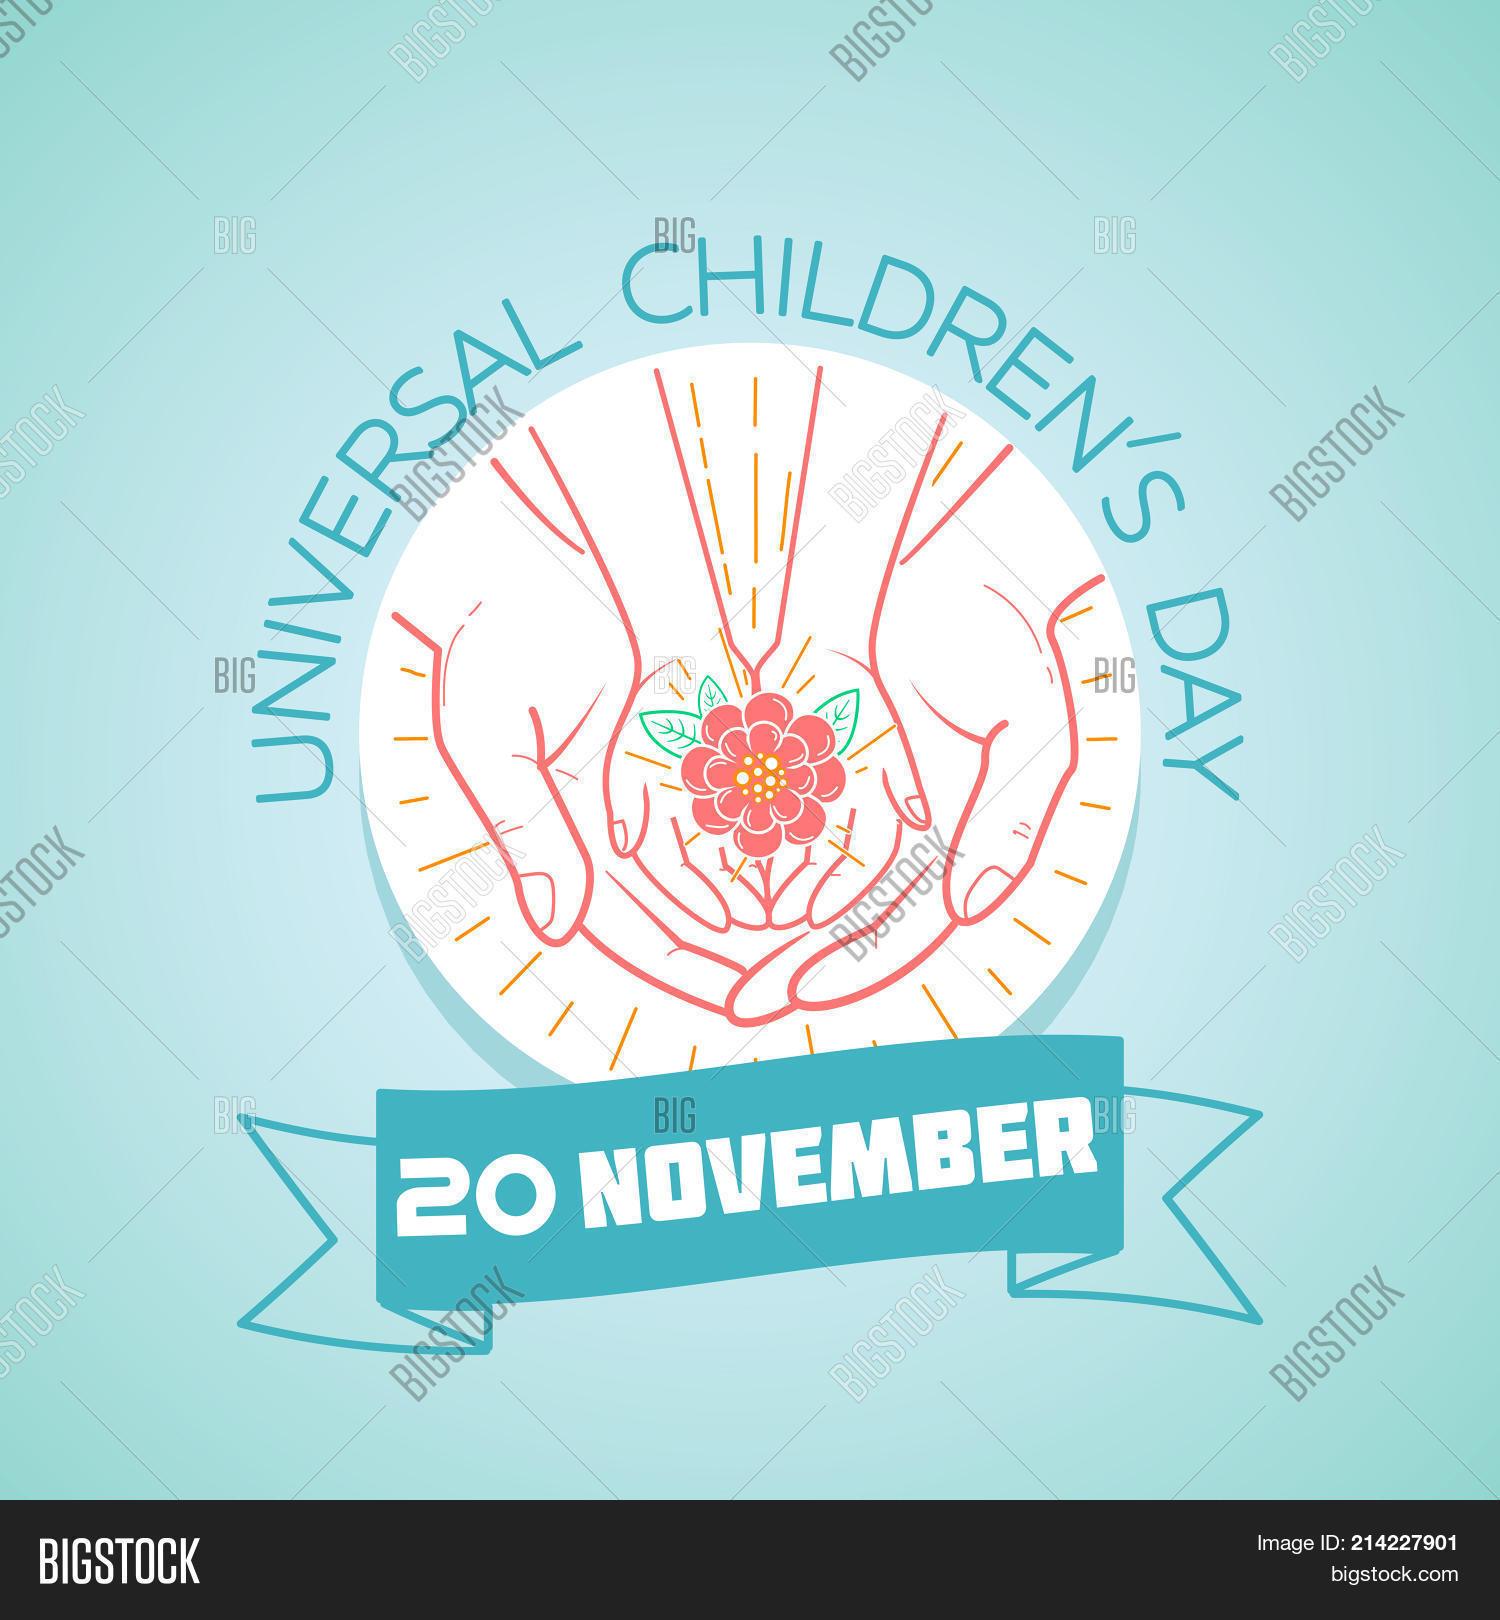 ecua universal childrens day - HD1000×1080